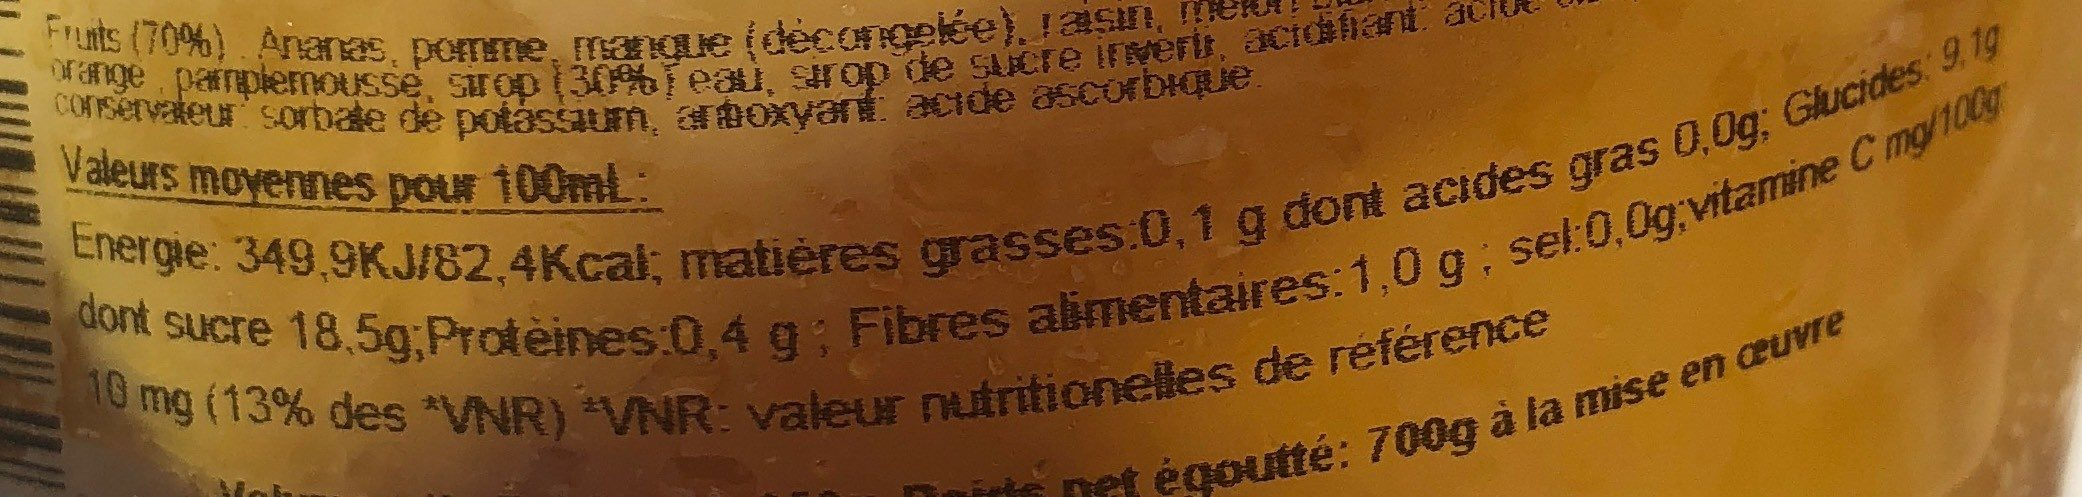 Salade de fruits - Informations nutritionnelles - fr